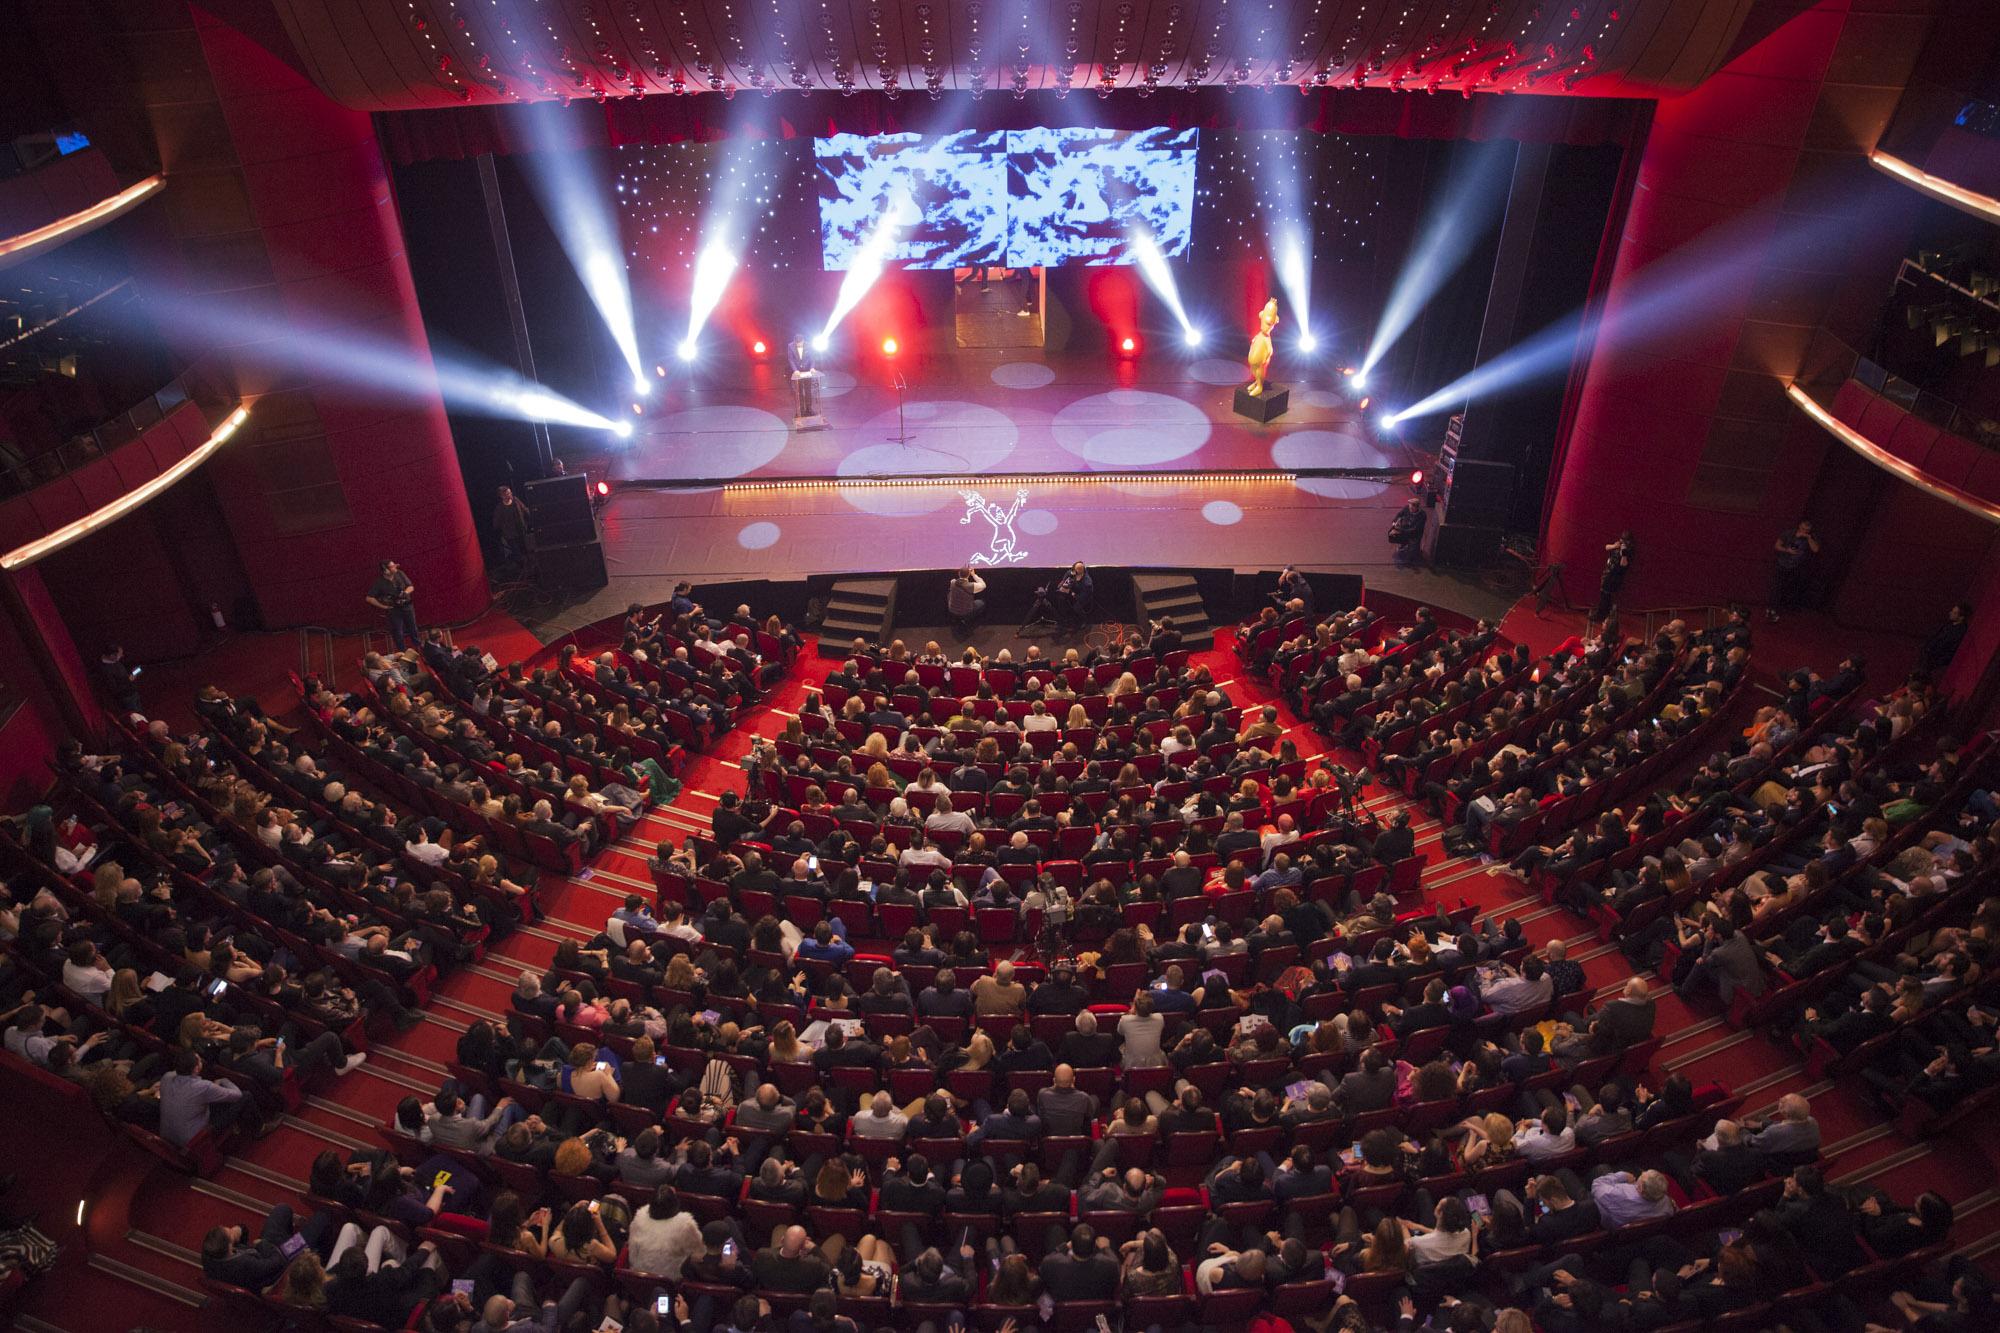 Premiile Gopo 2019 - care sunt marii castigatori